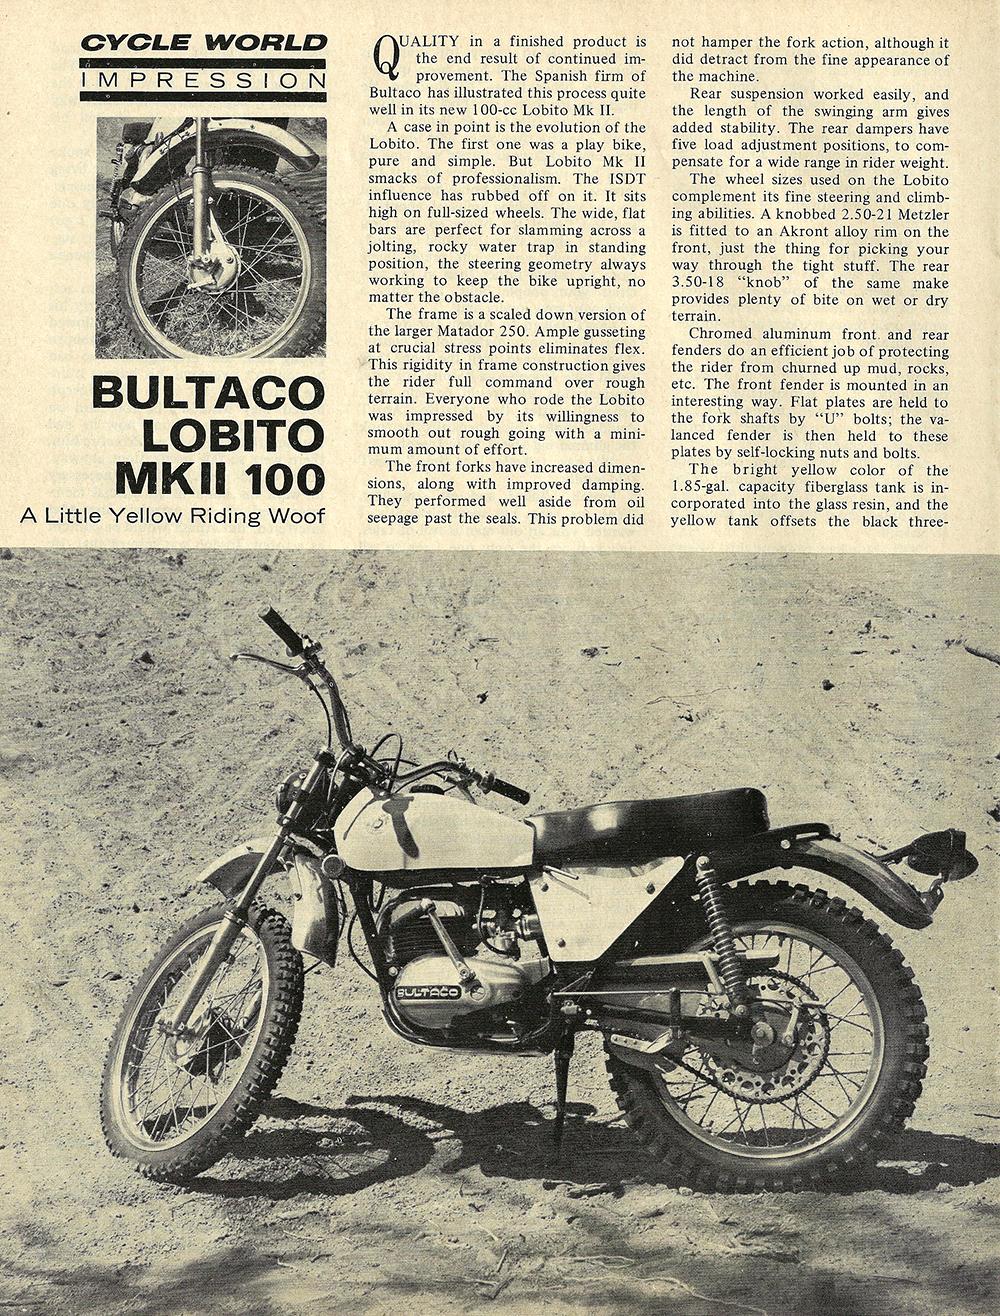 1970 Bultaco Lobito 100 mk2 road test 01.jpg